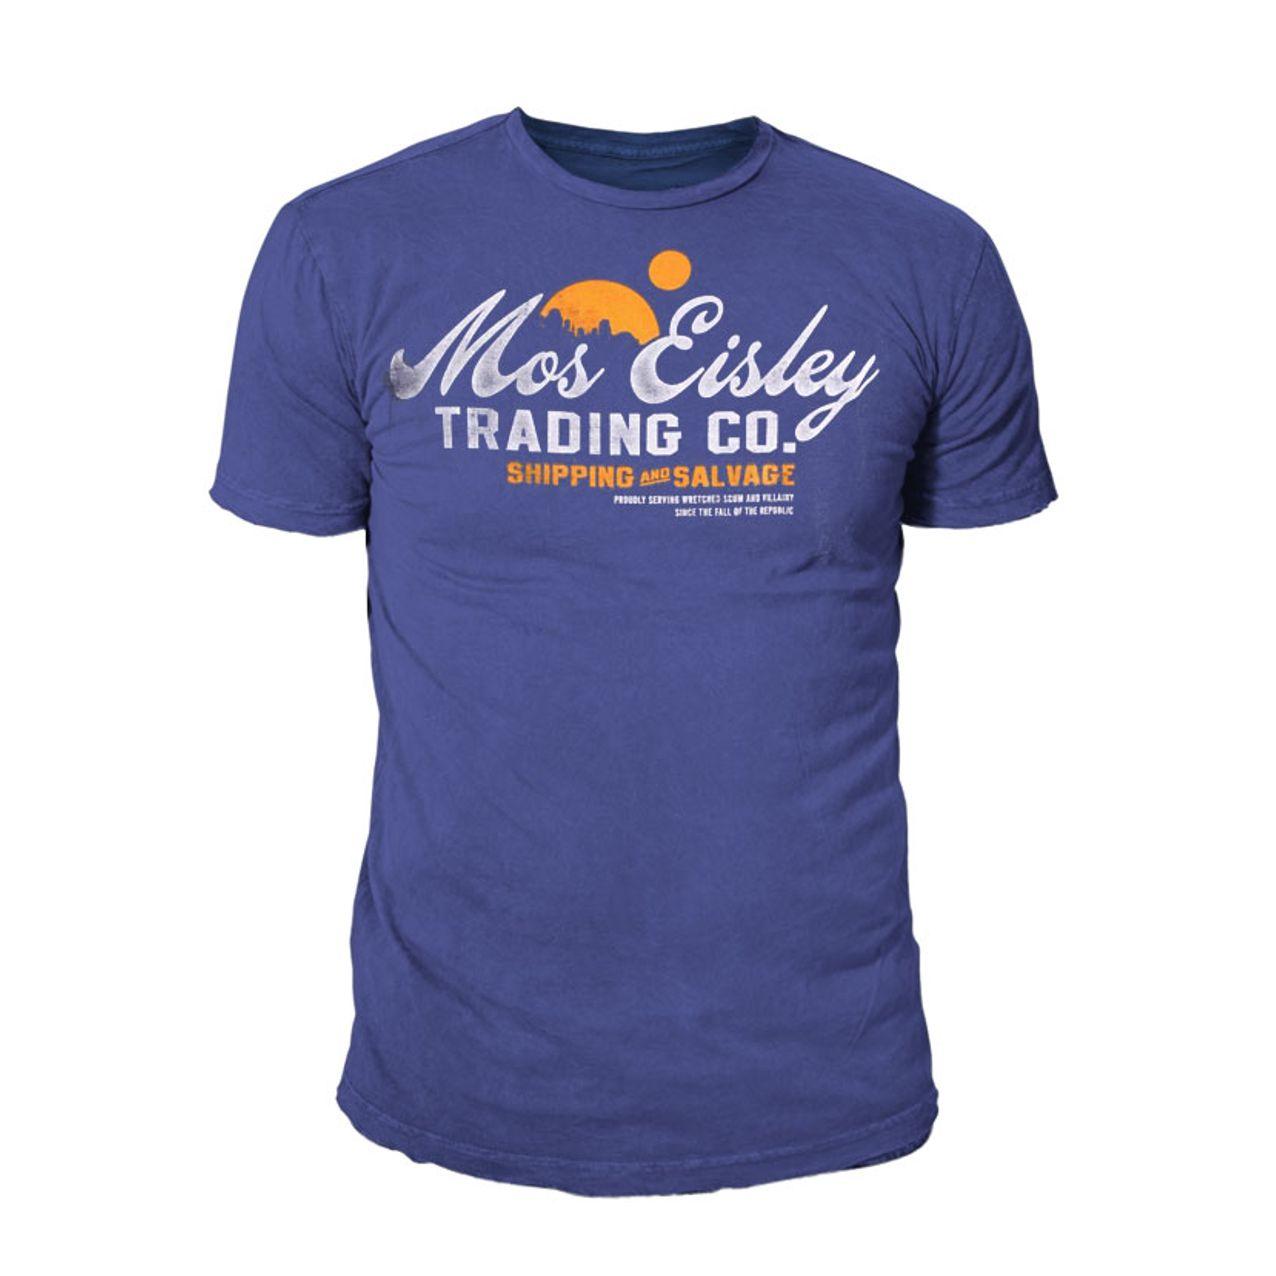 Star Wars - Mos Eisley Trading Herren T-Shirt | The Studio ...